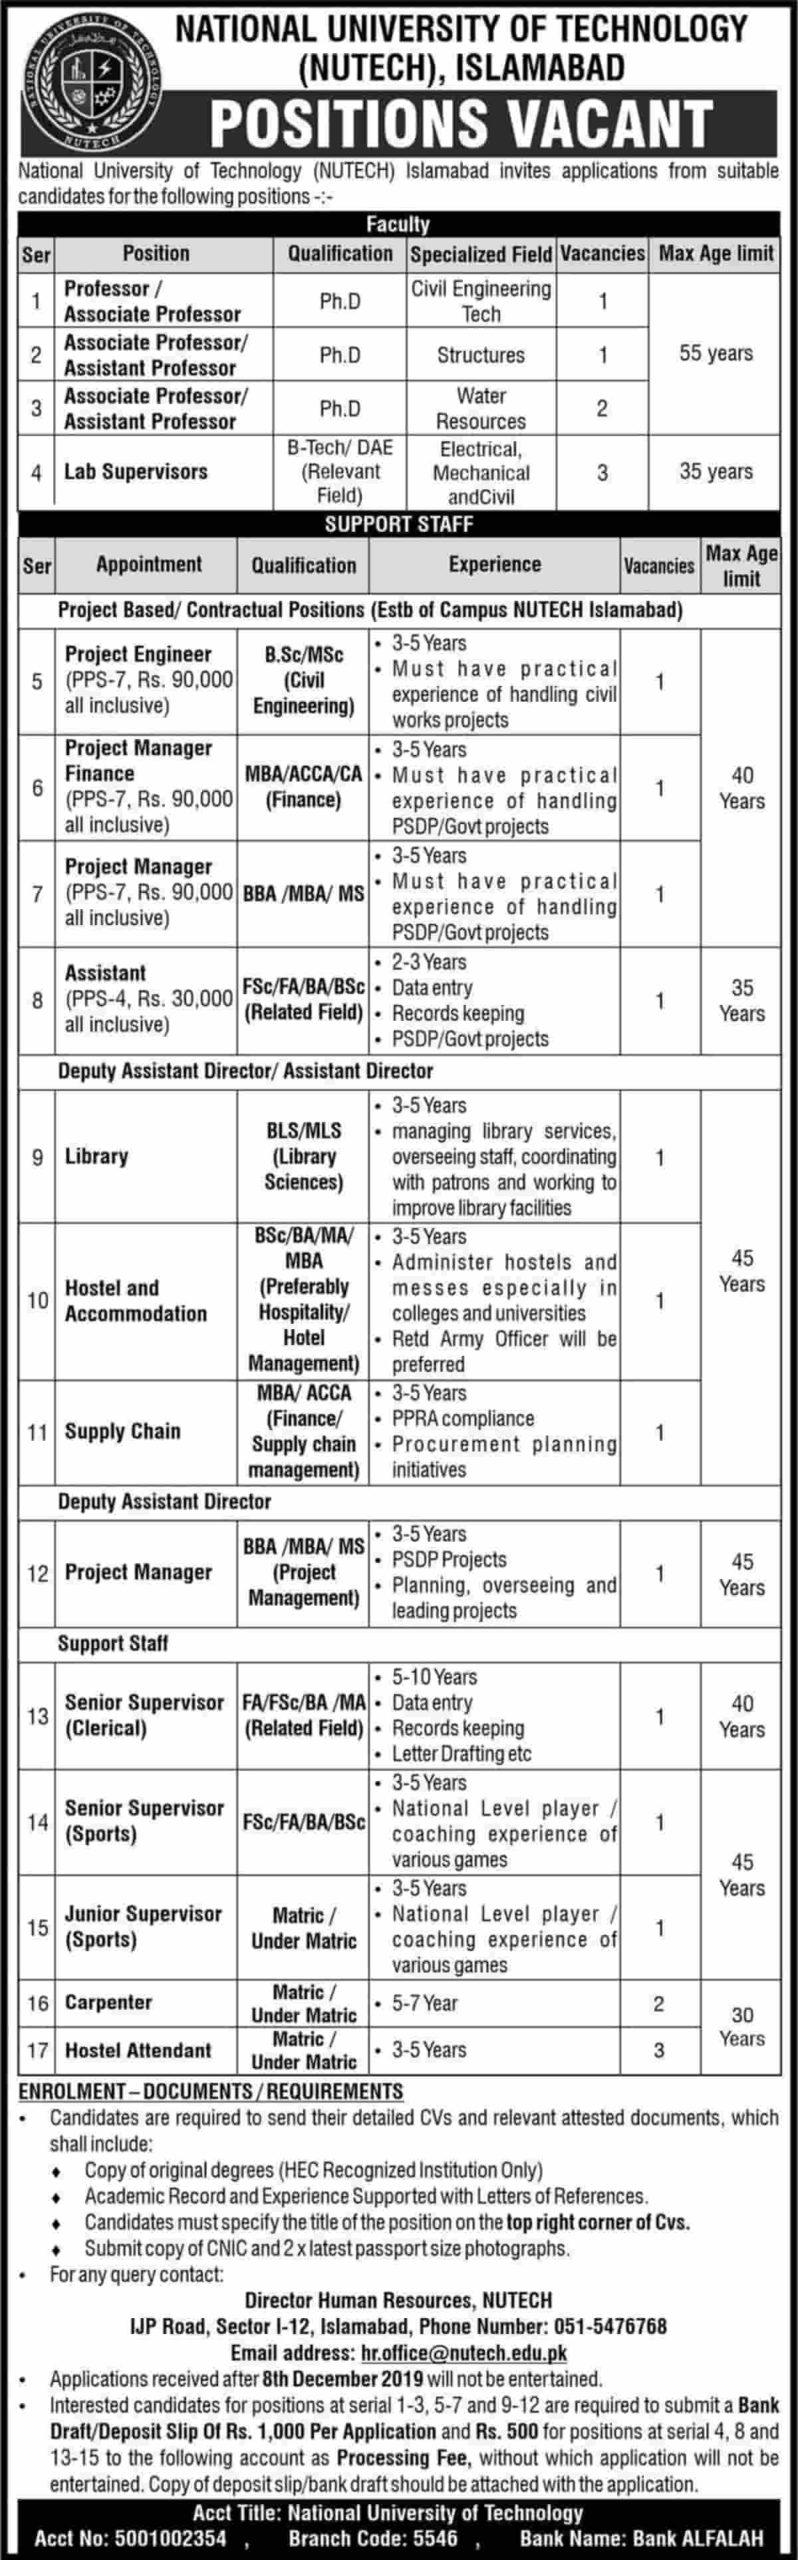 National-University-of-Technology-NUTECH-Islamabad-Jobs-2019-Latest